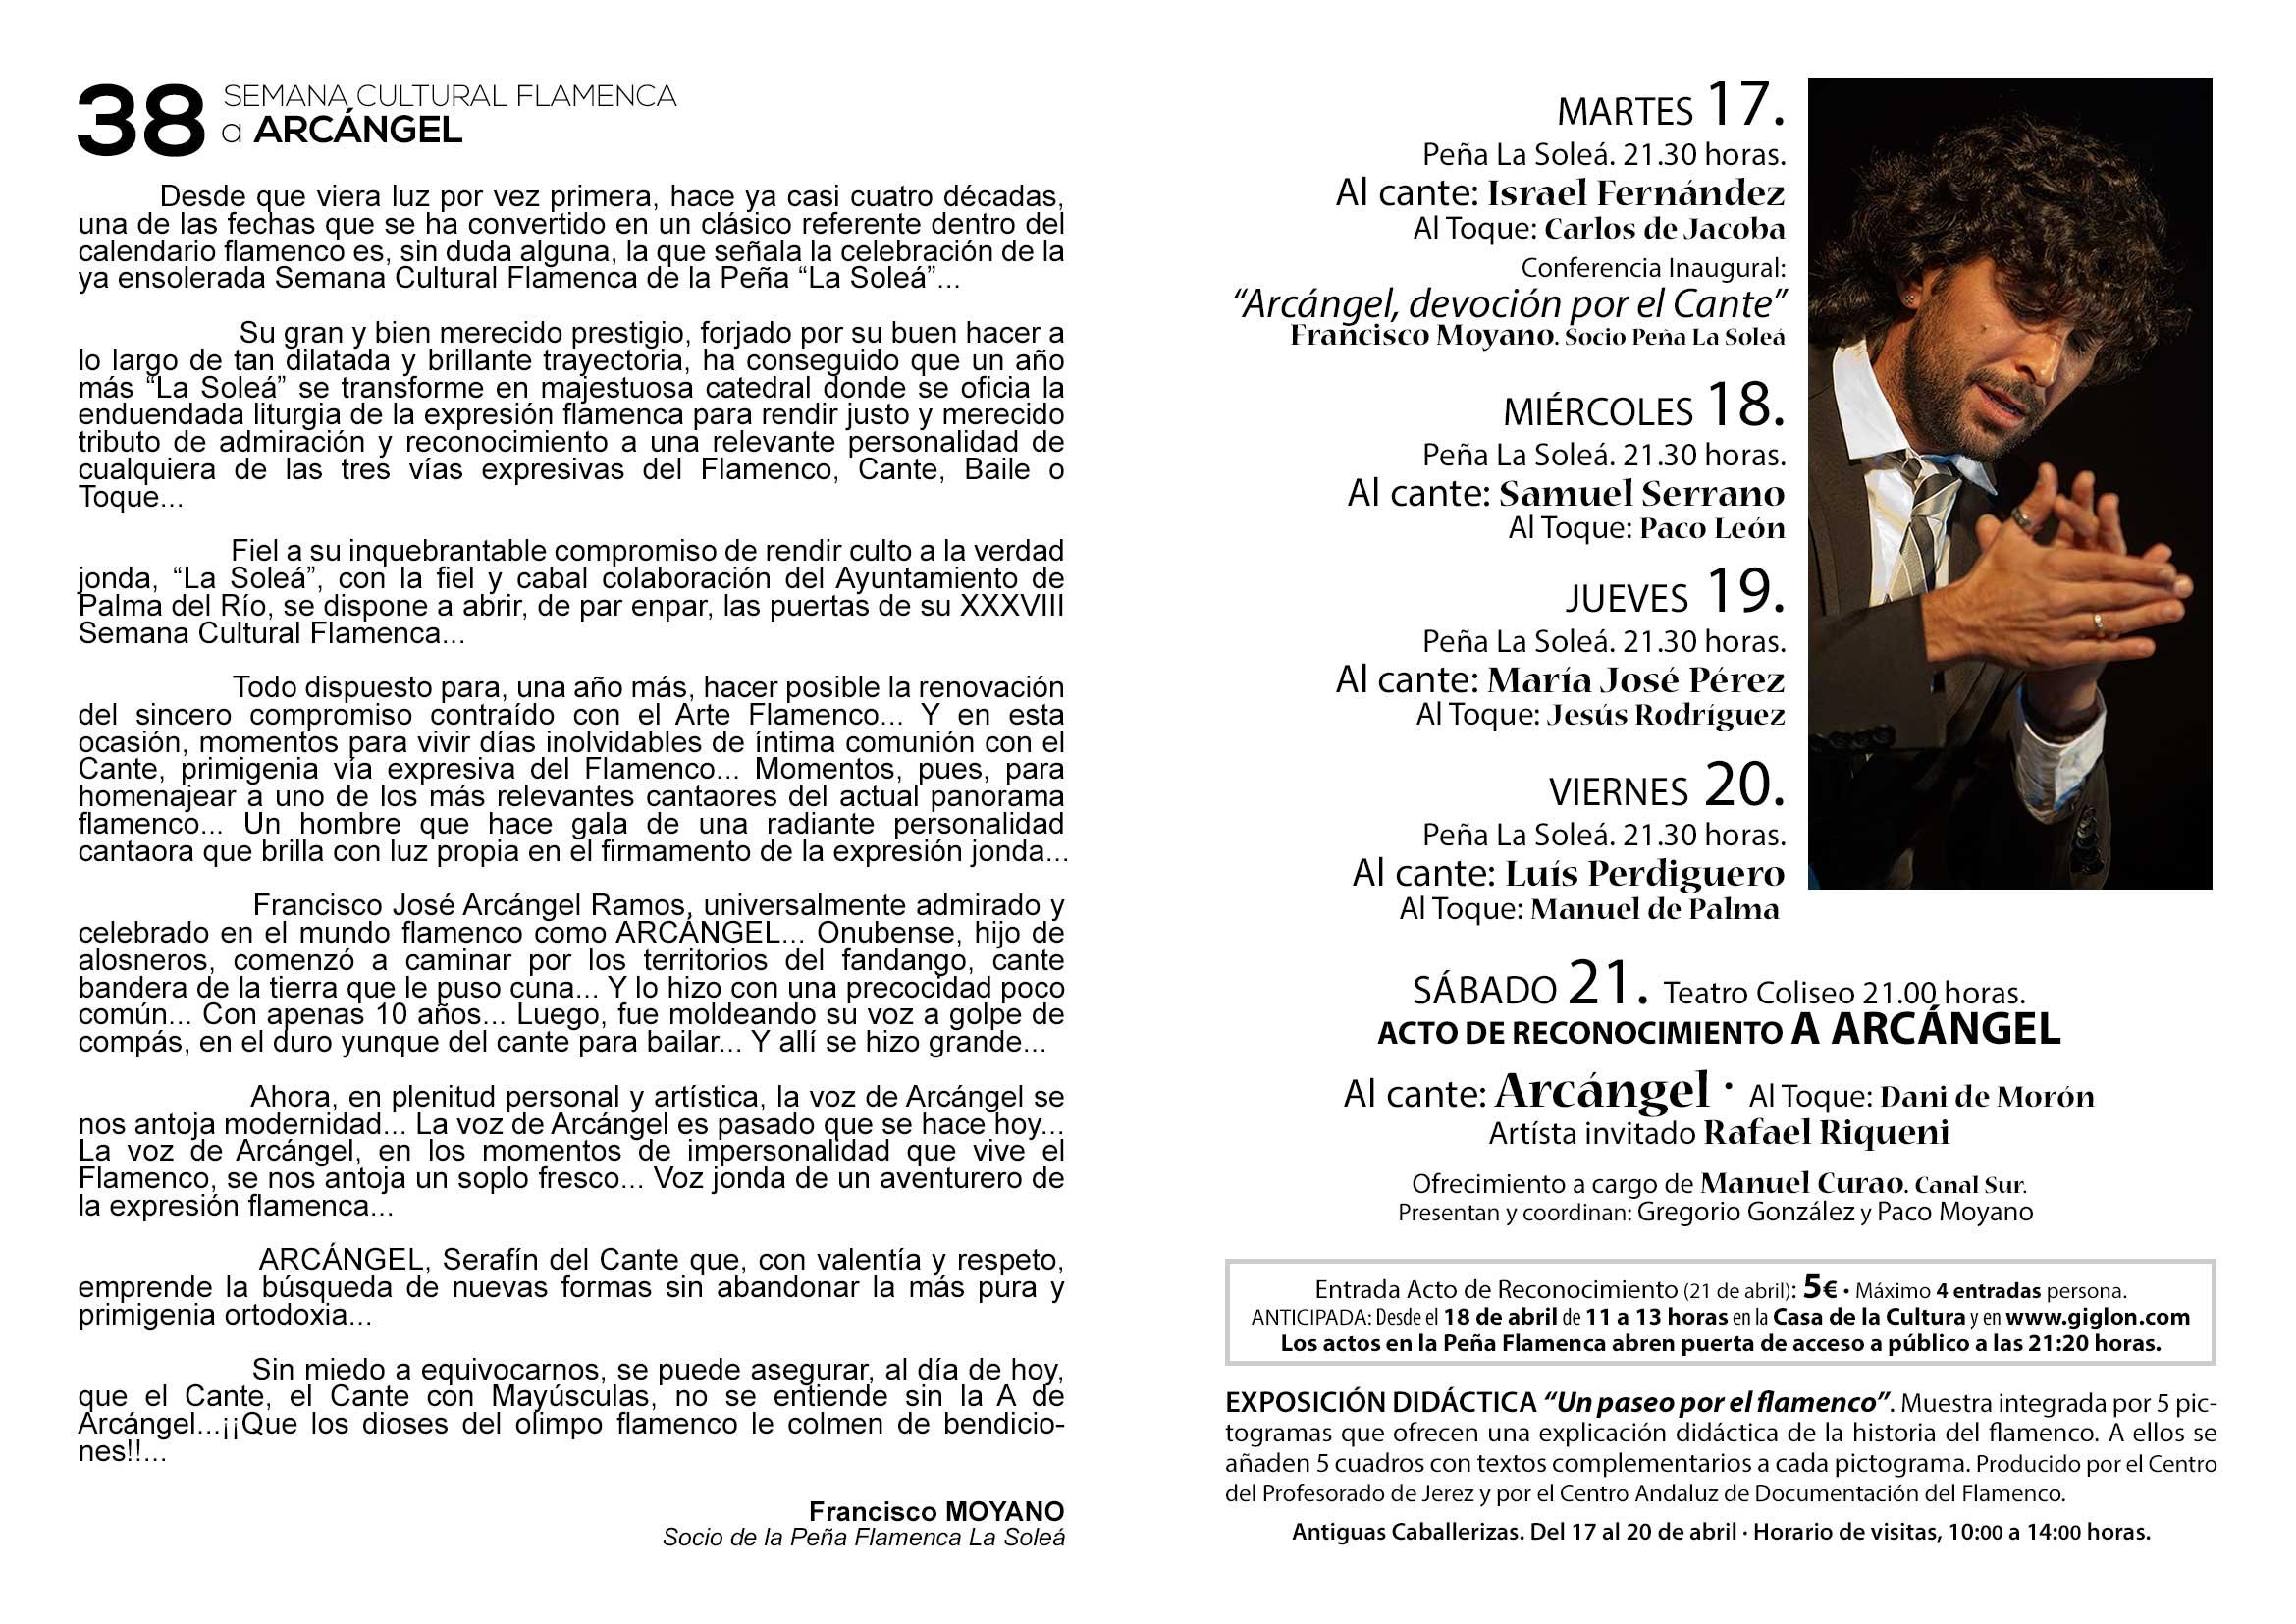 https://www.palmadelrio.es/sites/default/files/nuevoprograma-flamenco-interior.jpg